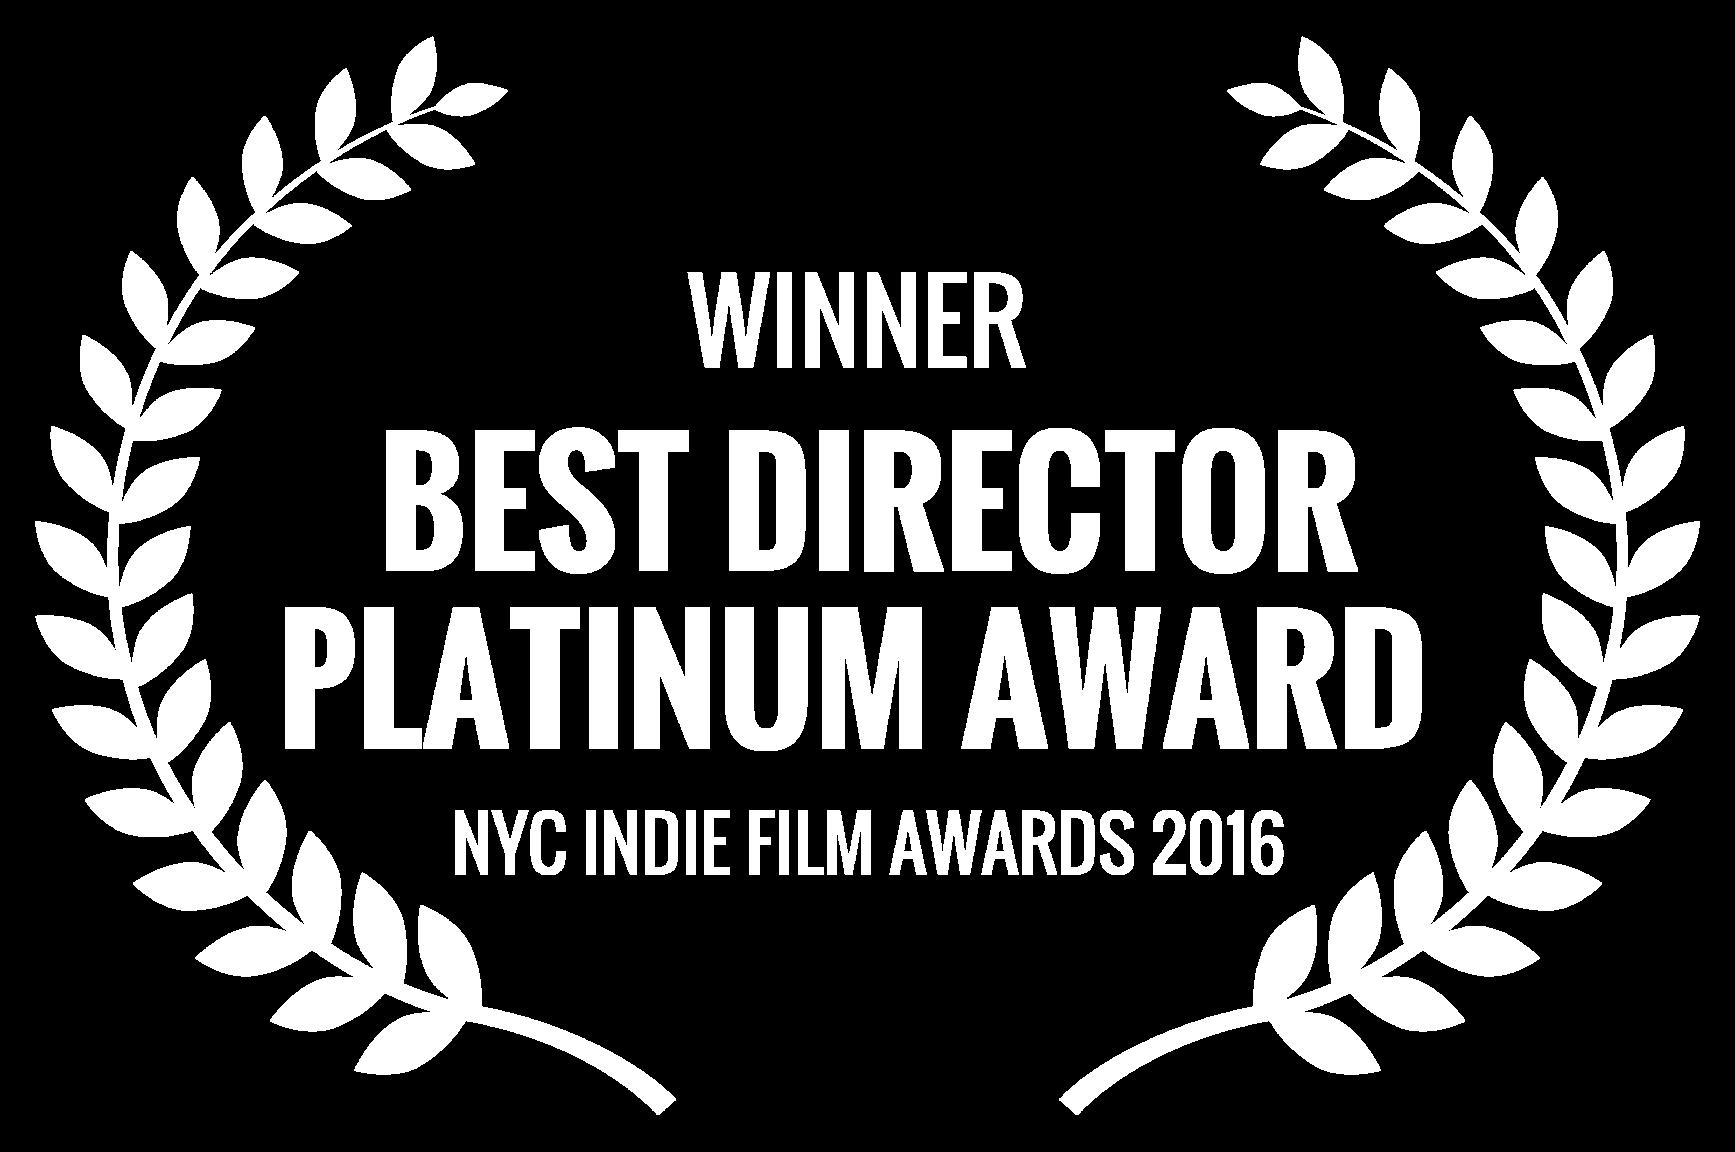 WINNER  - BEST DIRECTOR PLATINUM AWARD  - NYC INDIE FILM AWARDS 2016 (1).png